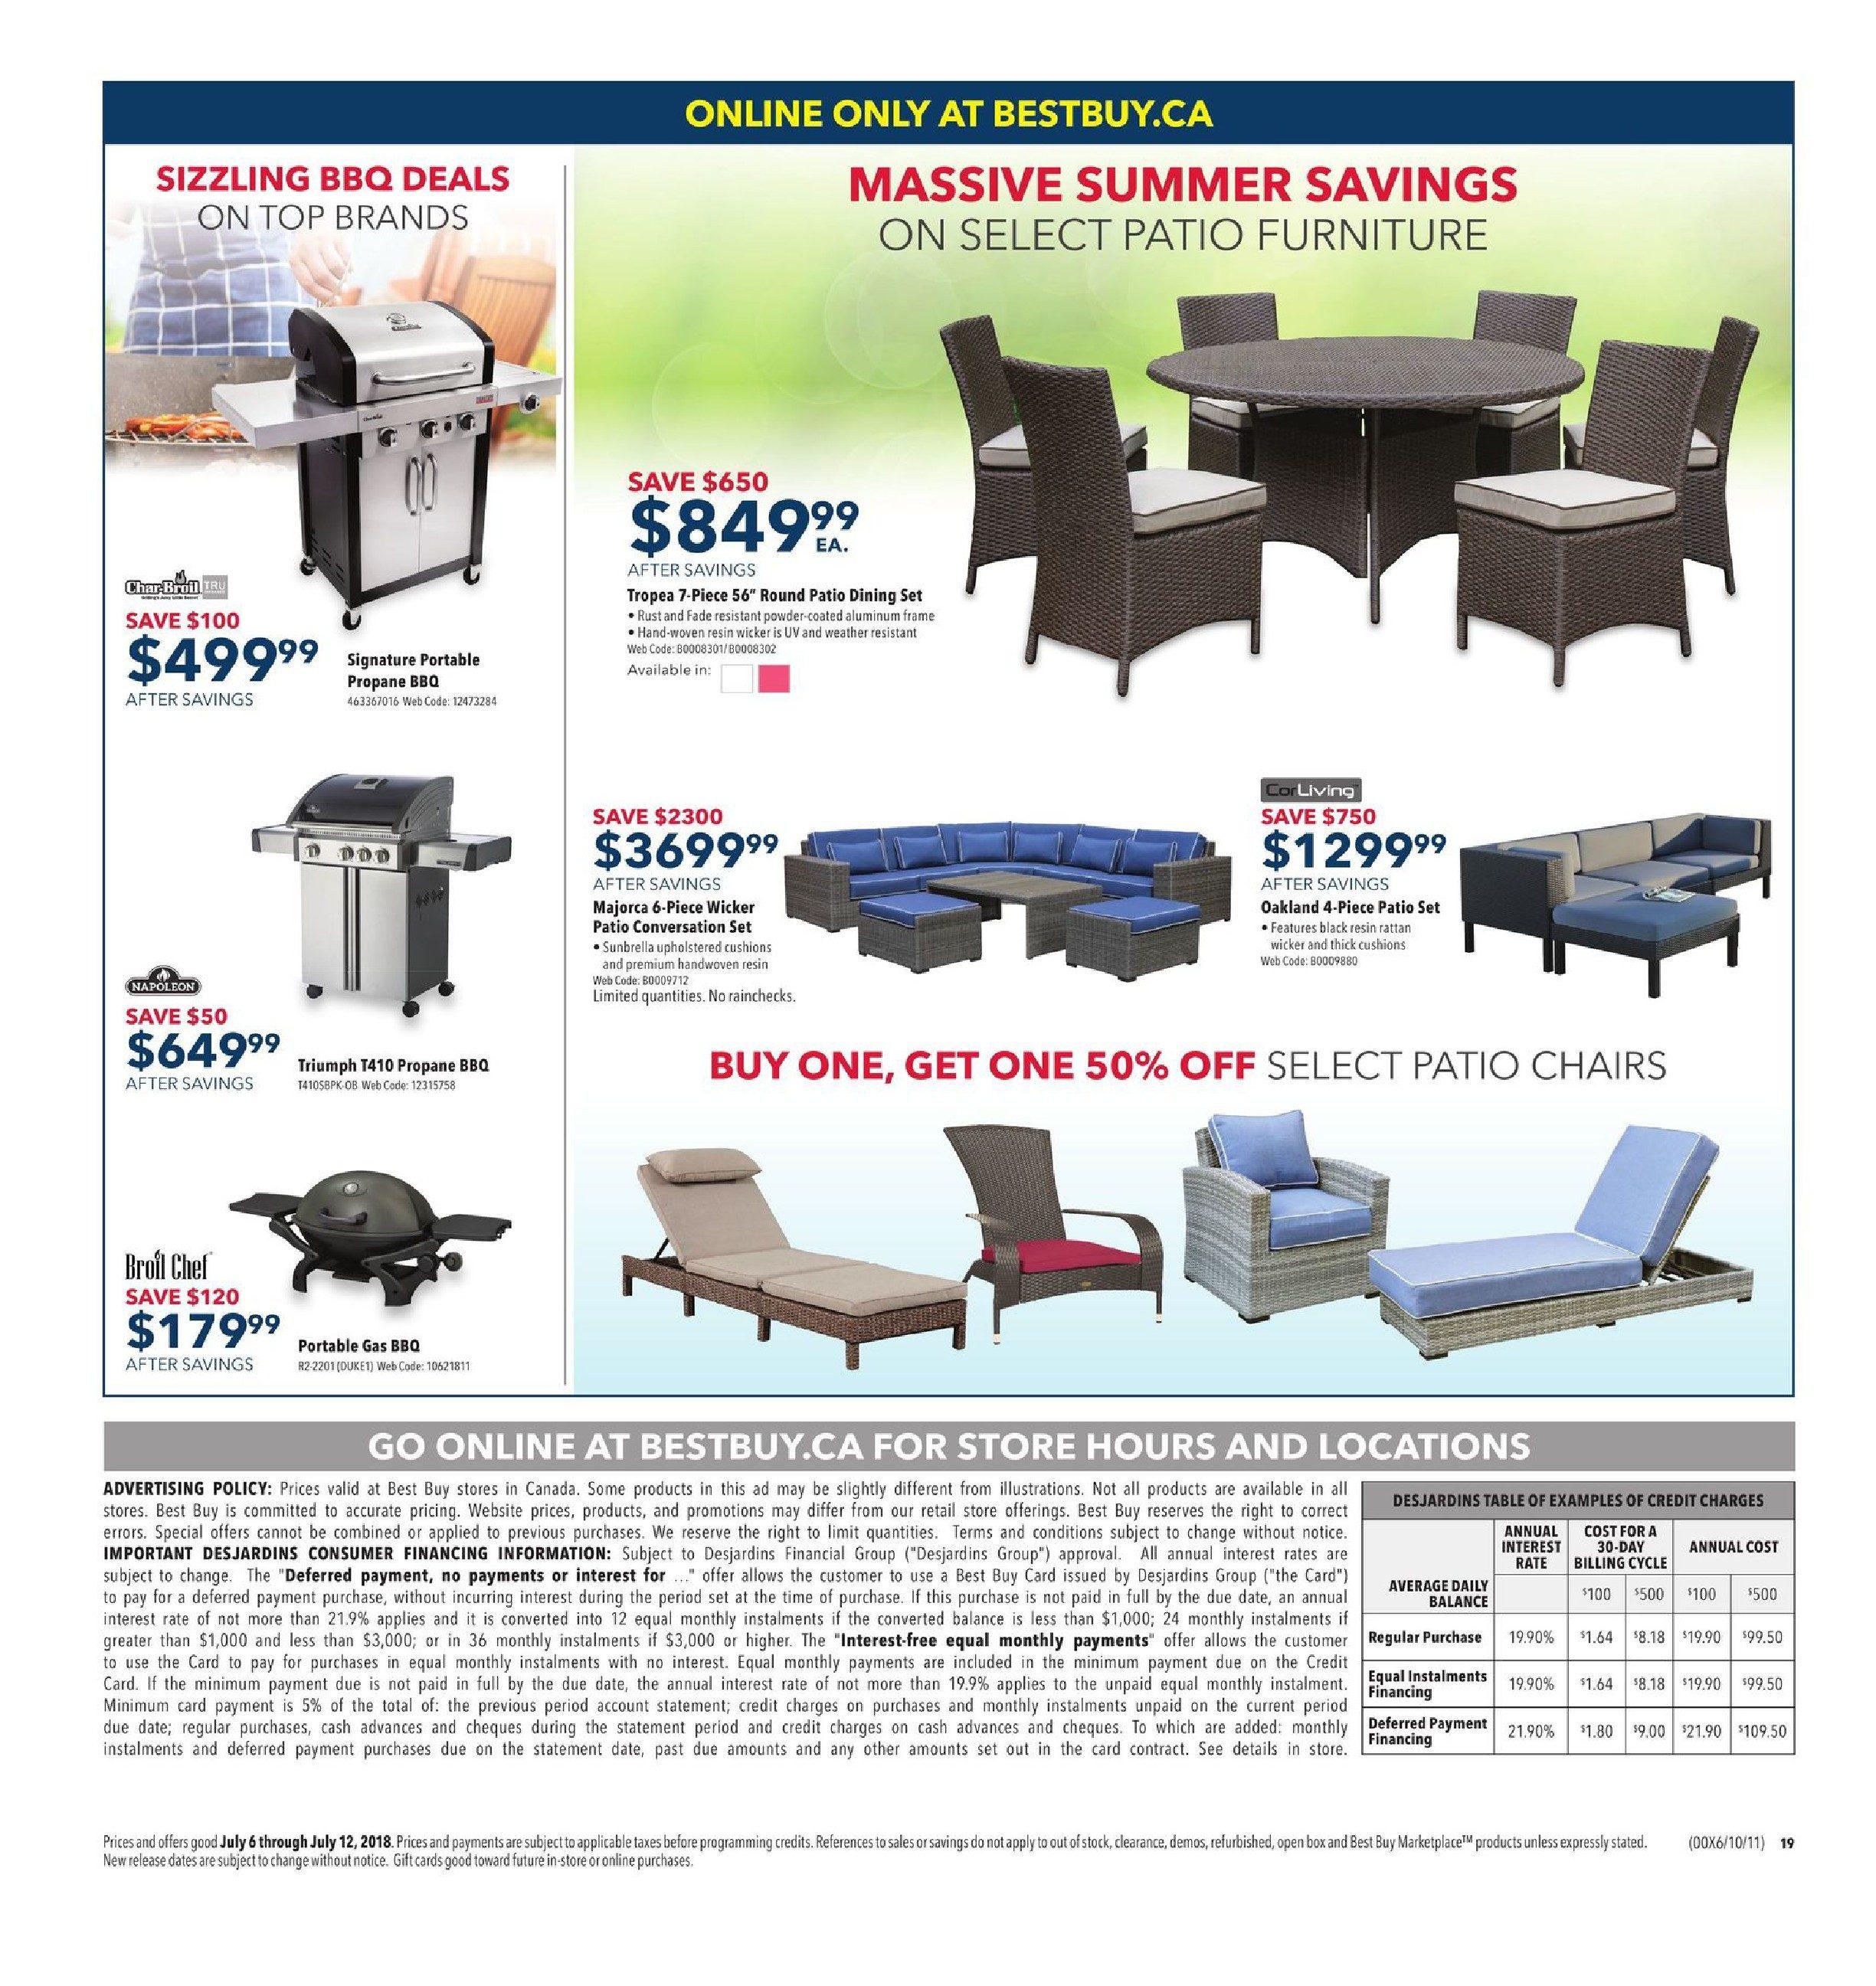 Best Buy Weekly Flyer Hot Tech At Even Hotter Savings Monitor Asus Vp247qg Gaming 236 Full Hd Tn 1ms 75hz Freesync Speaker Jul 6 12